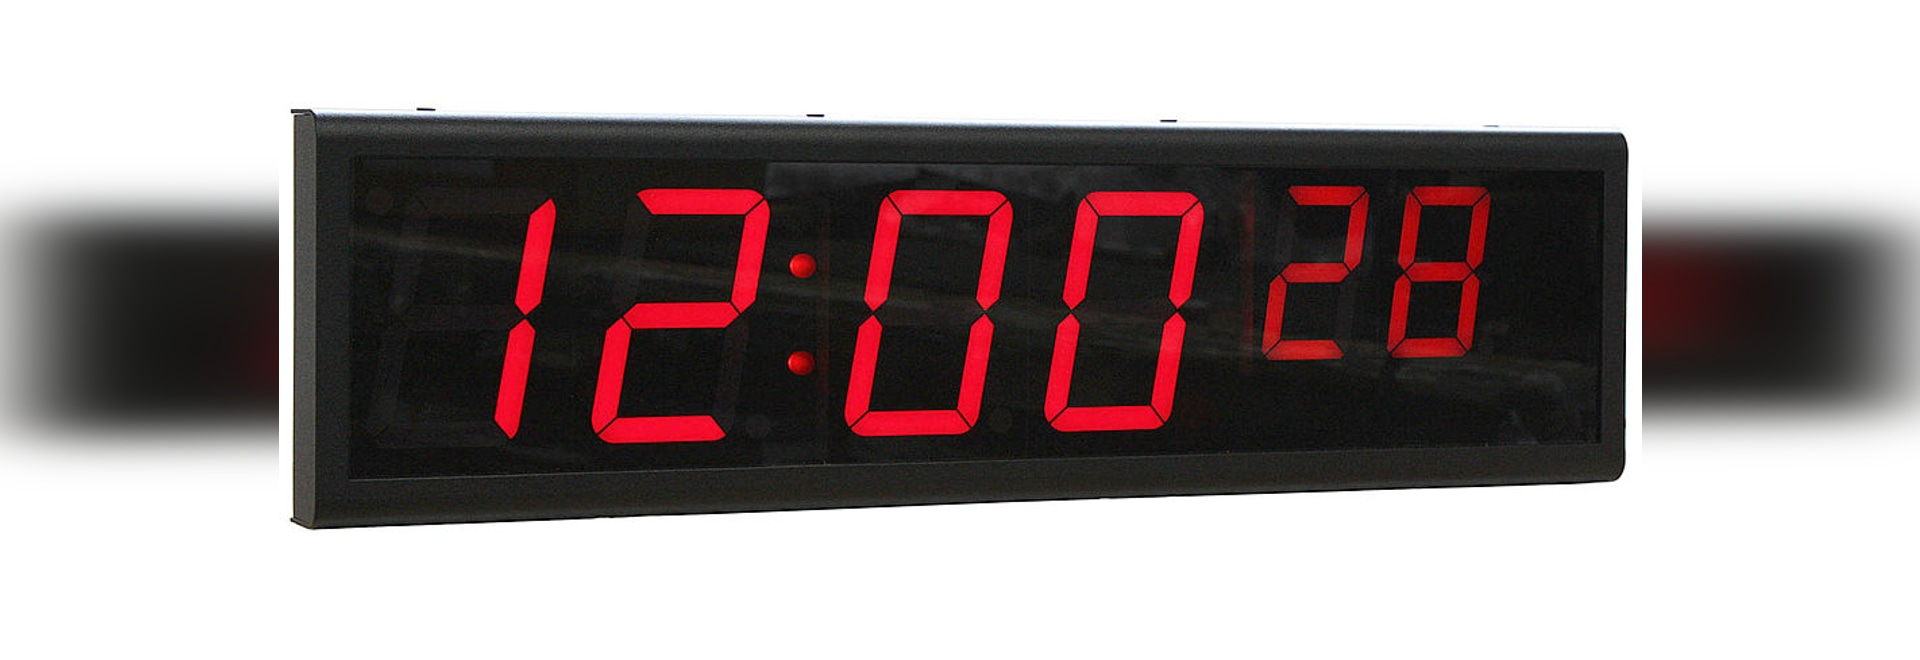 6 Digit, Digital Signal Clock Improves Business Performance